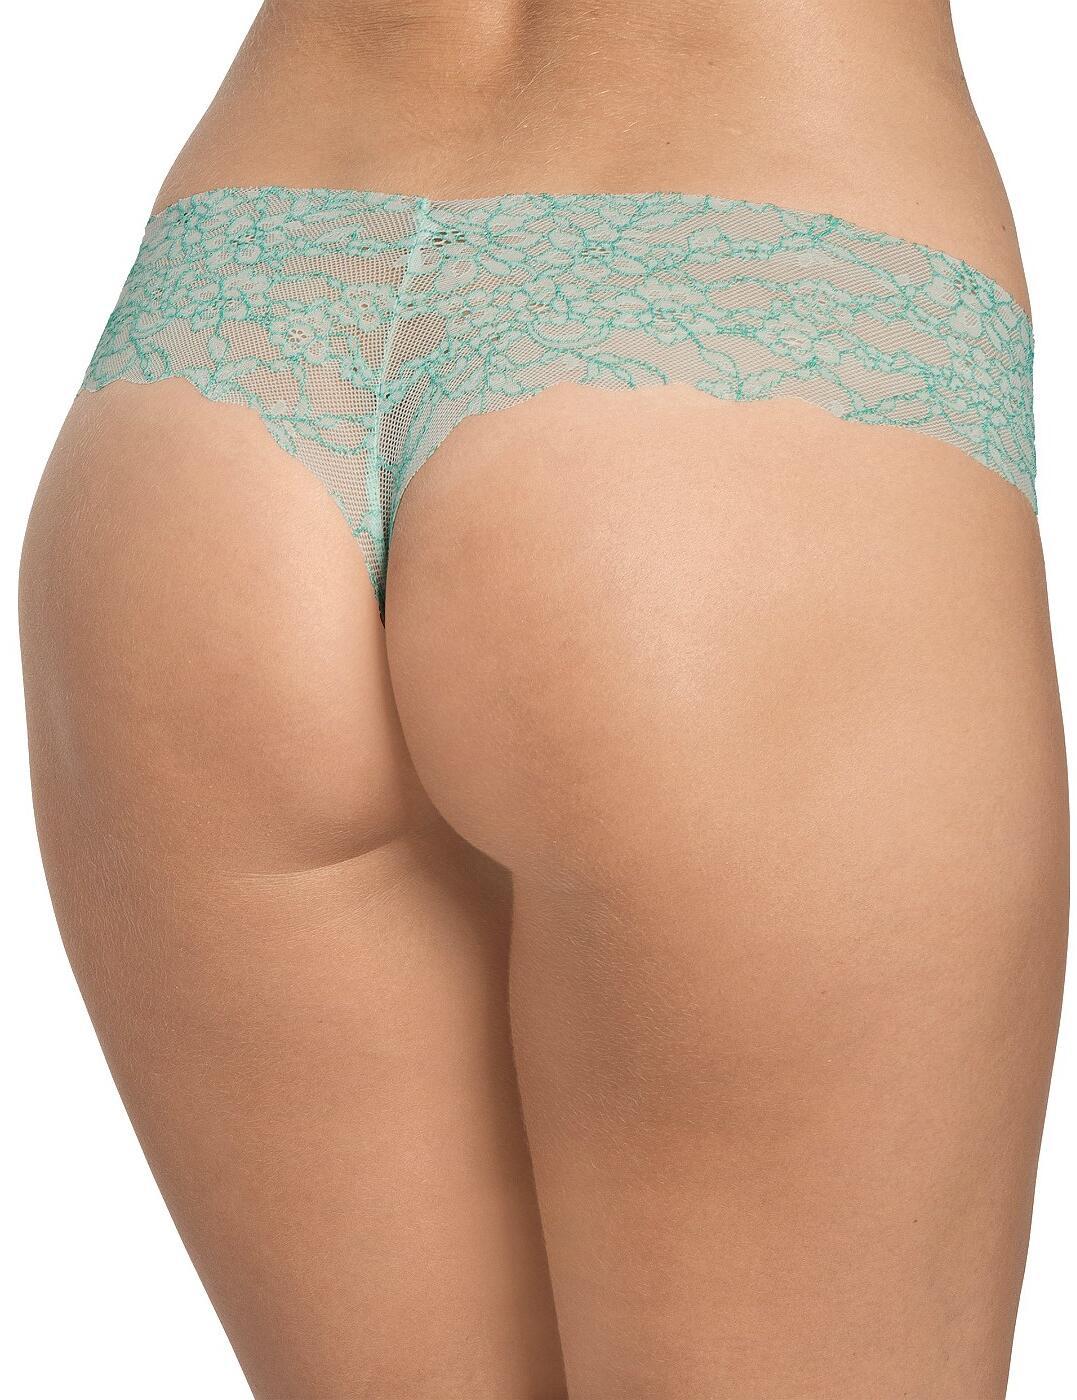 Sloggi Light Lace 10144012 2.0 Brazil Panty New Womens Brief Knickers